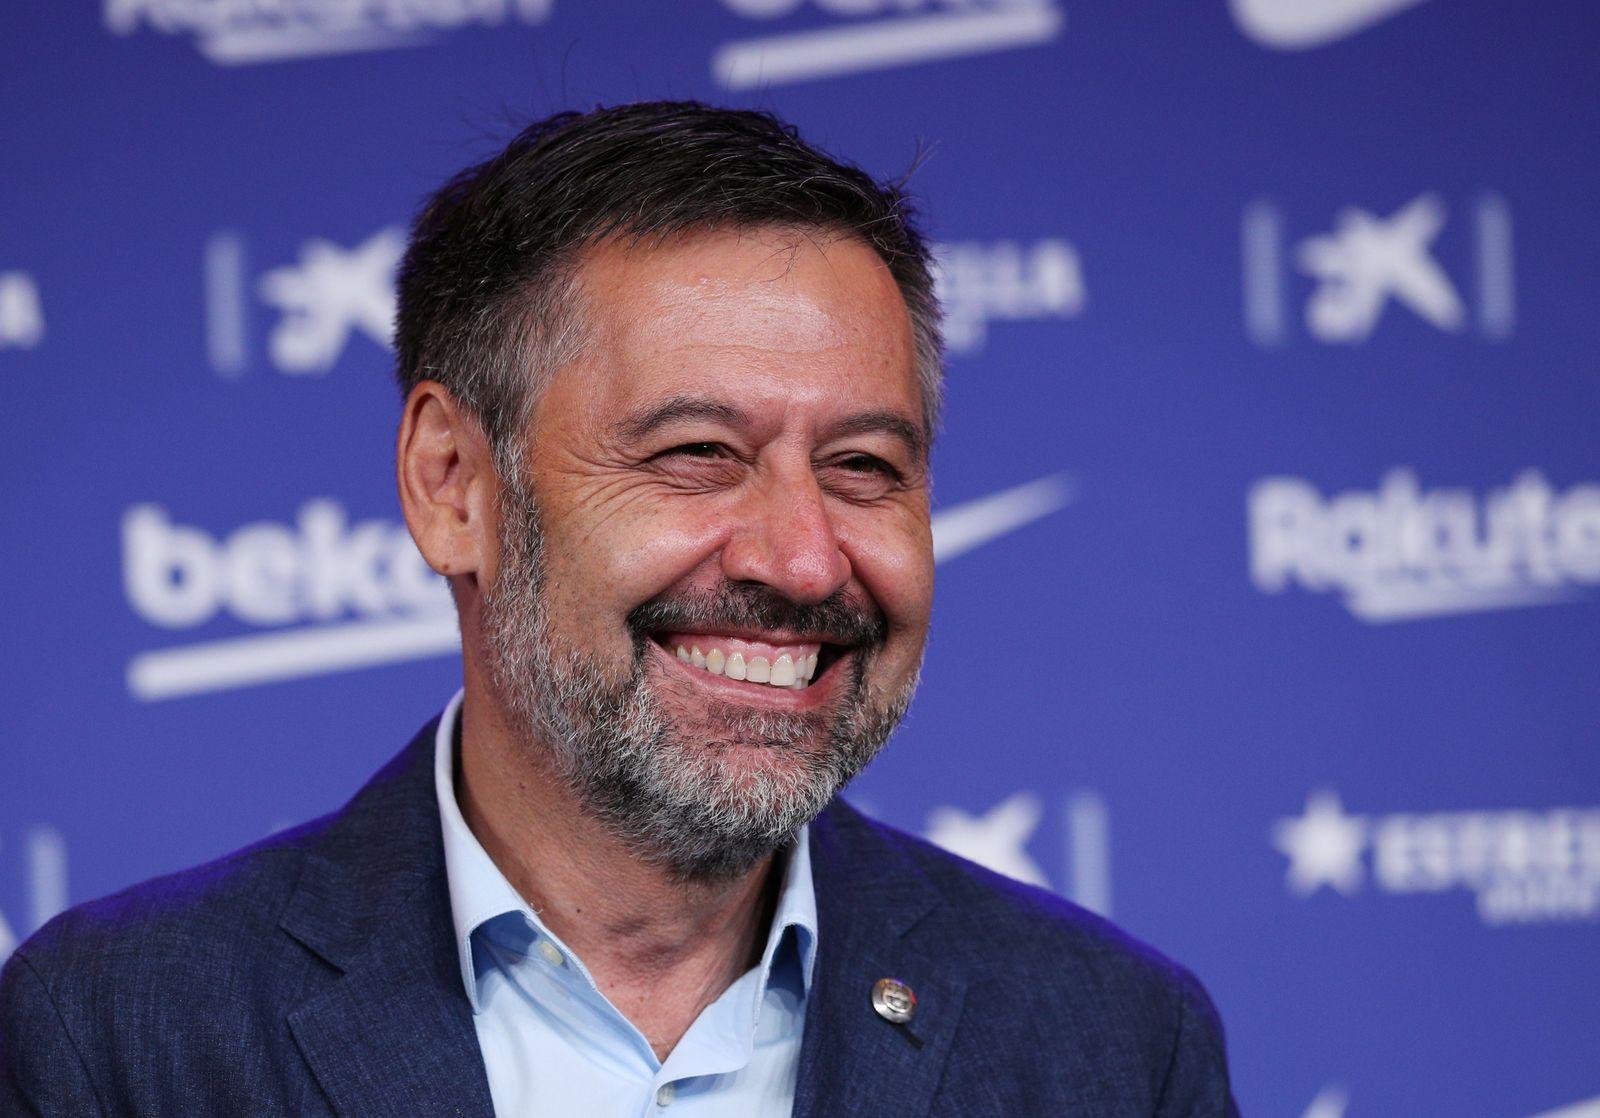 FC Barcelona unveil new signing Pedri